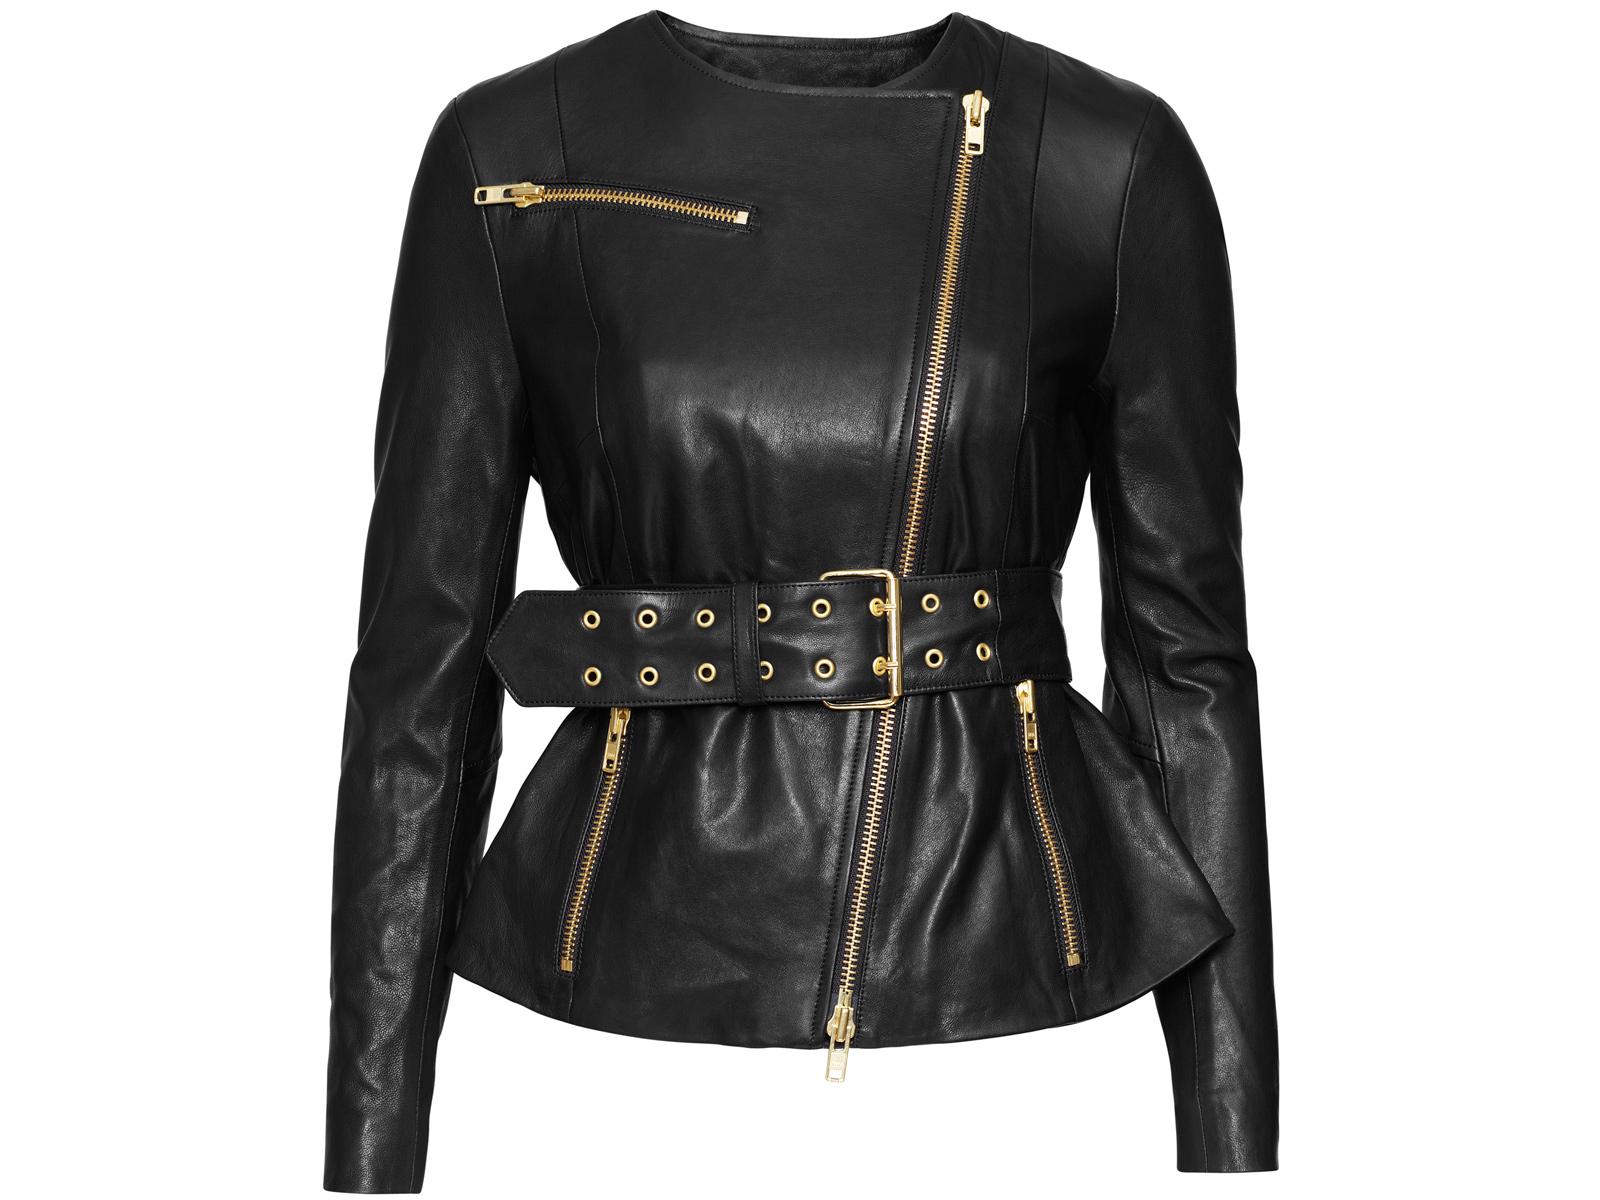 Куртка, H&M   Атриум, ул. Земляной Вал, 33, тел. (495) 933 5517 цена  9 999 руб.